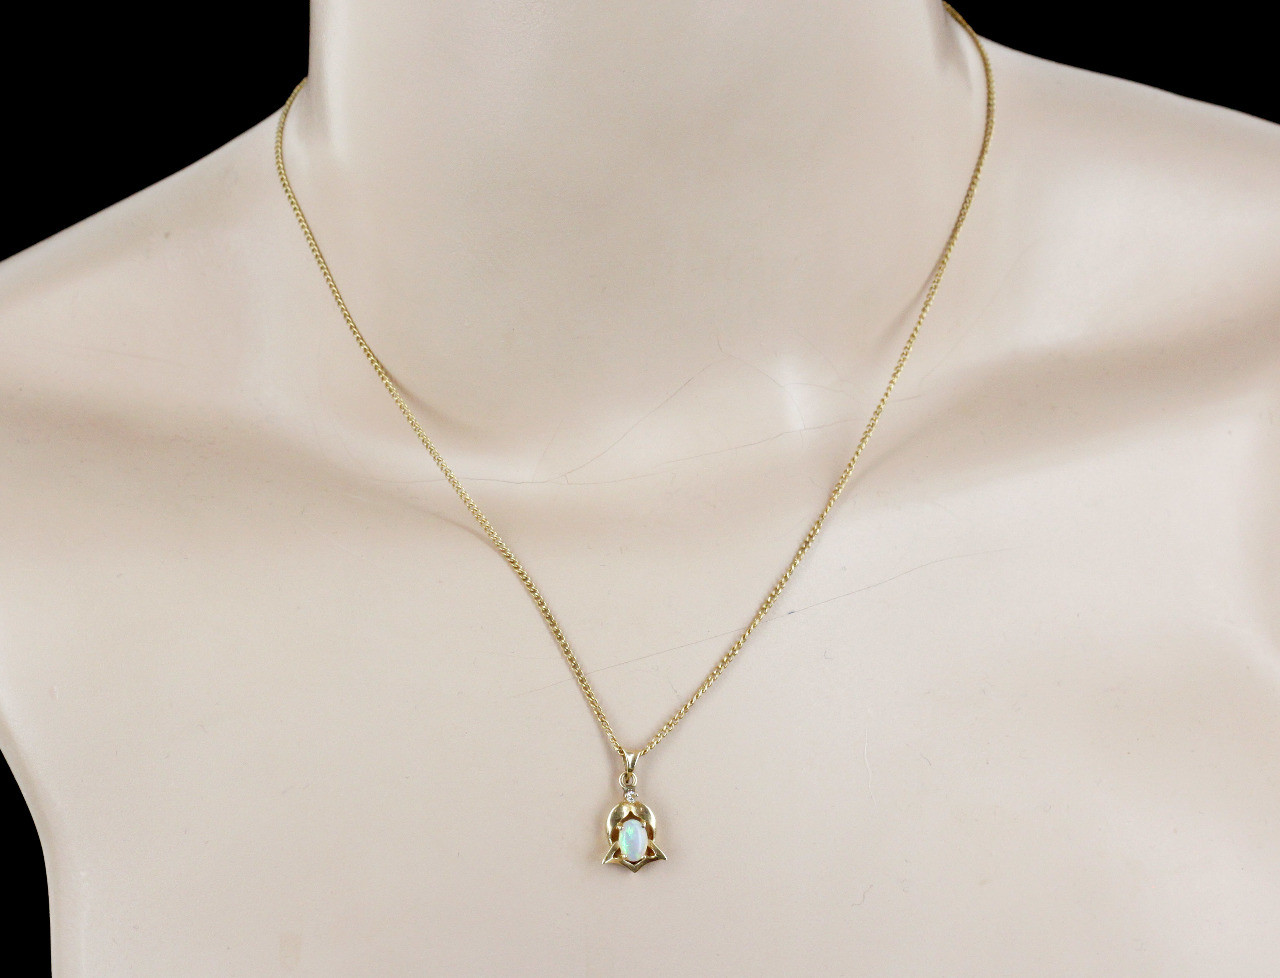 Vintage 14K Yellow Gold Diamond and Australian Jelly Opal Pendant Necklace 24